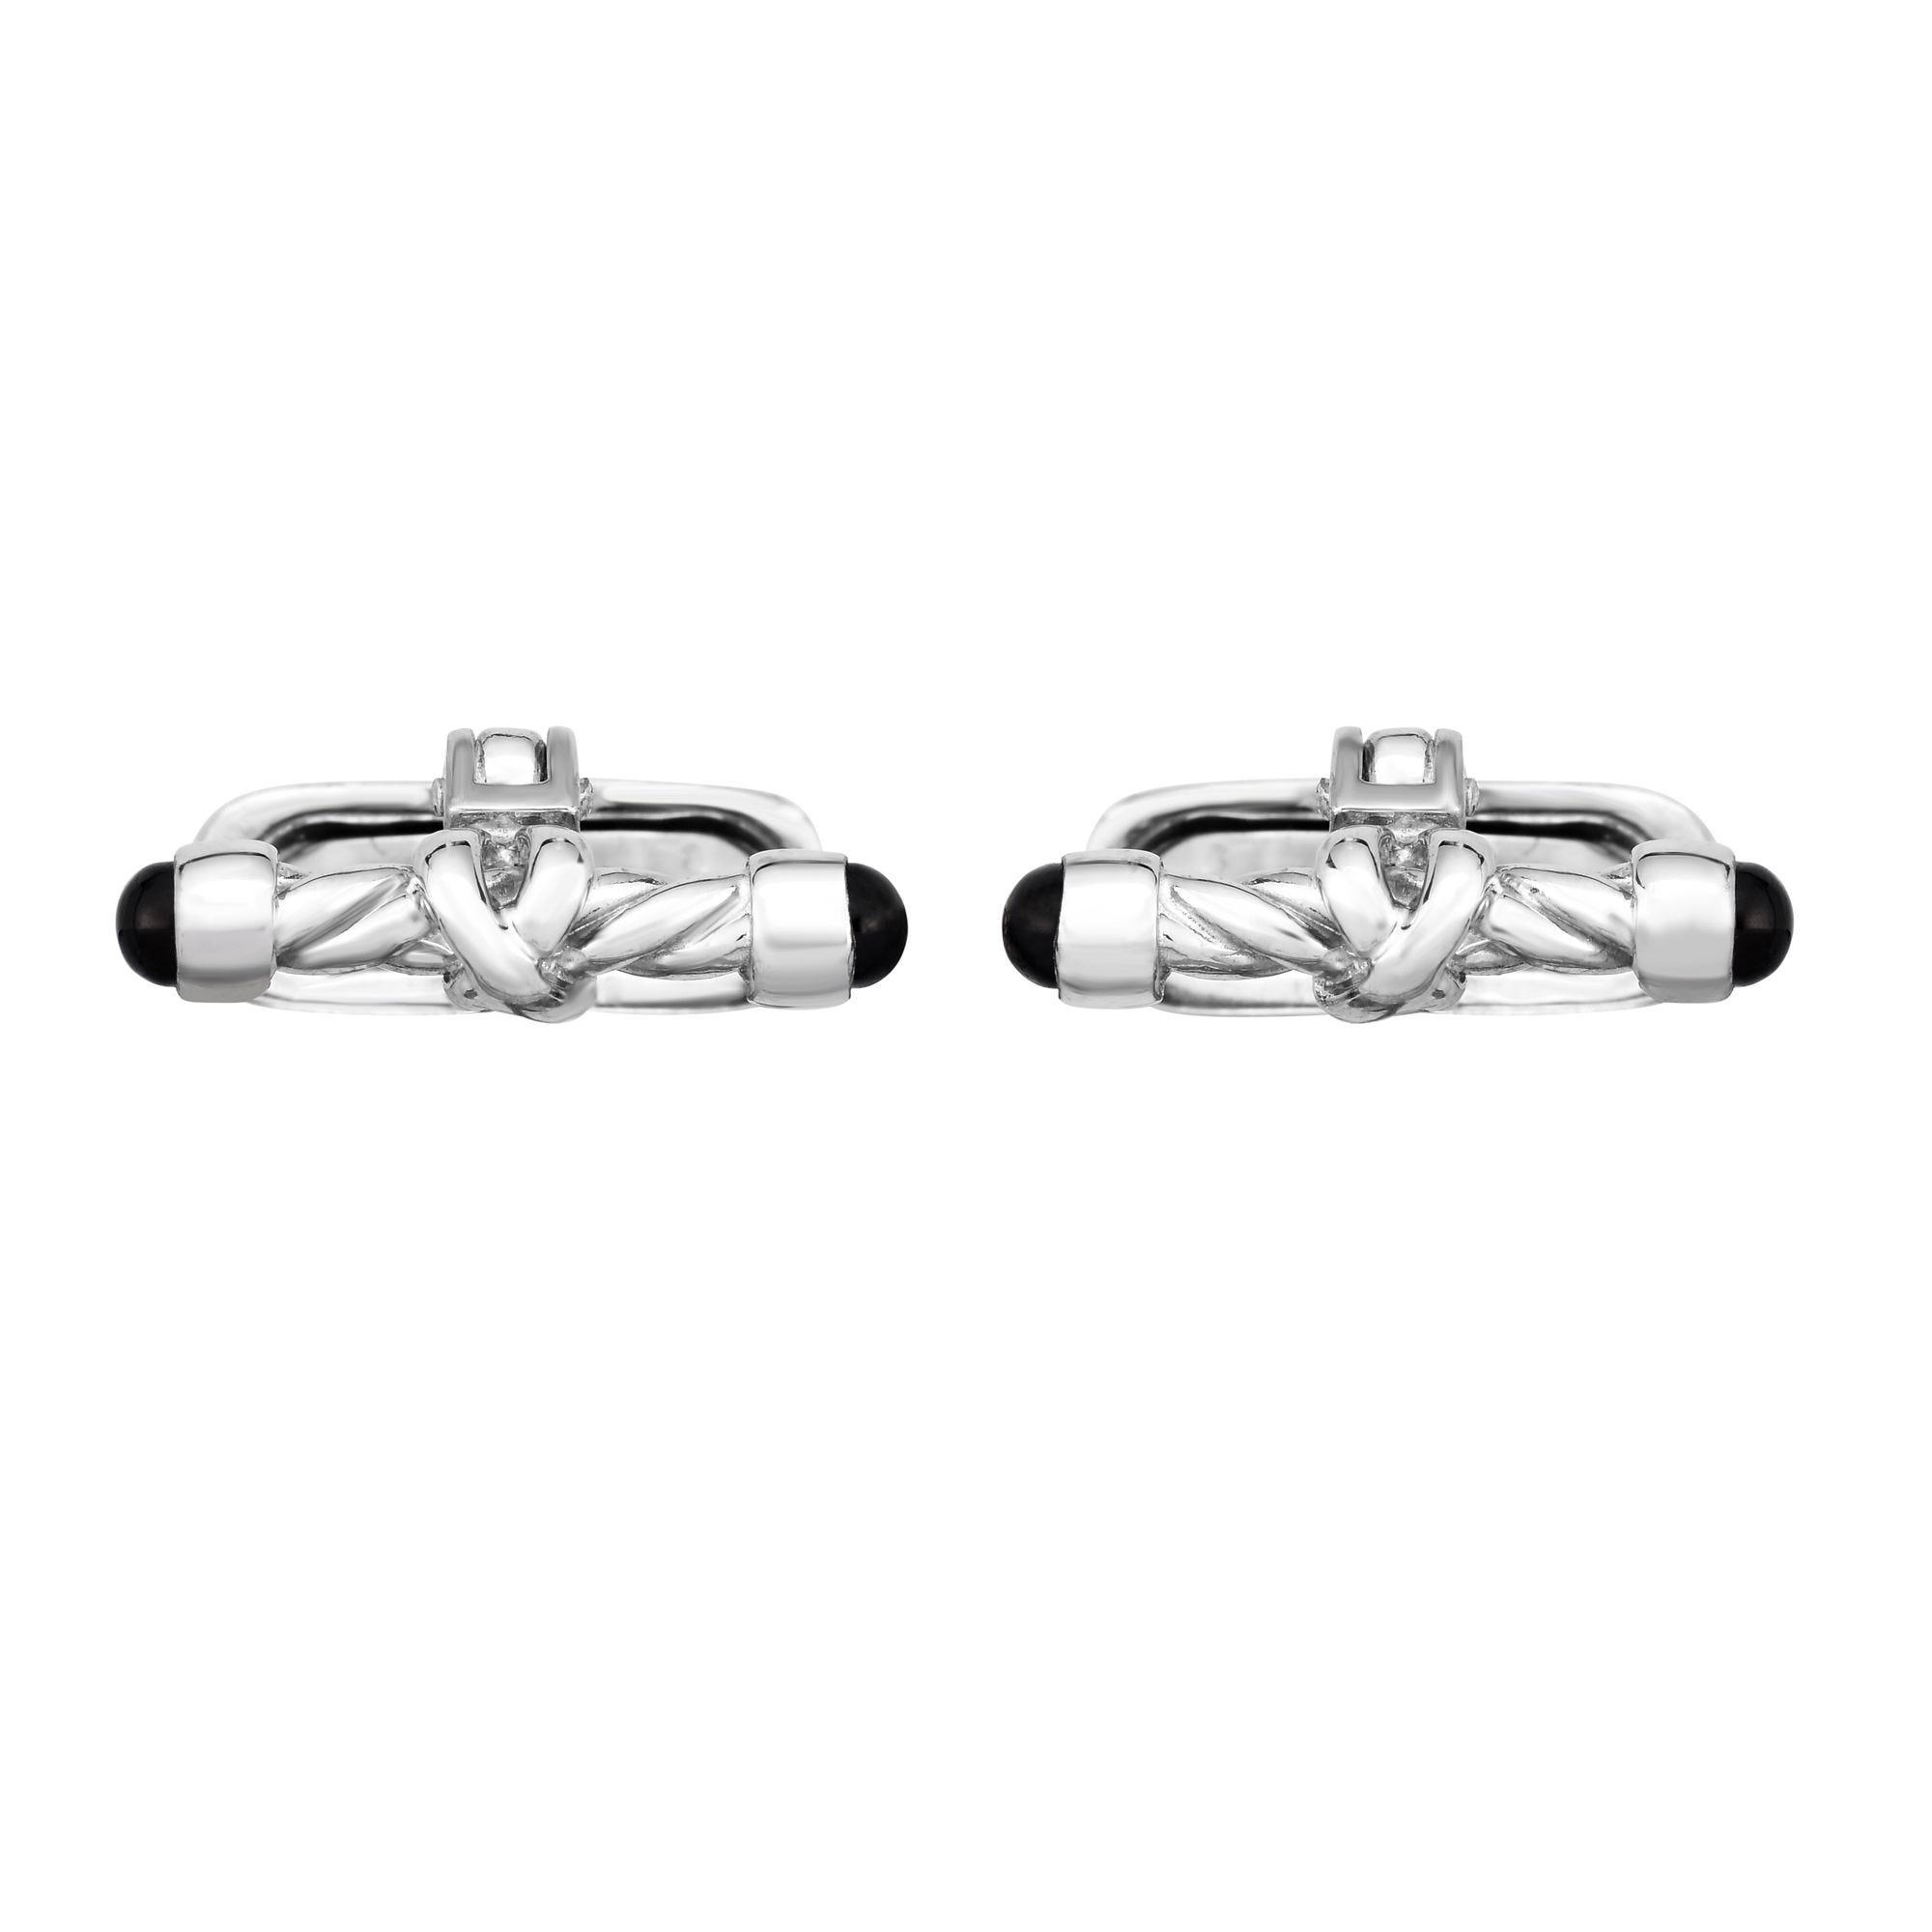 Knot Cufflinks 8x20mm in Sterling Silver